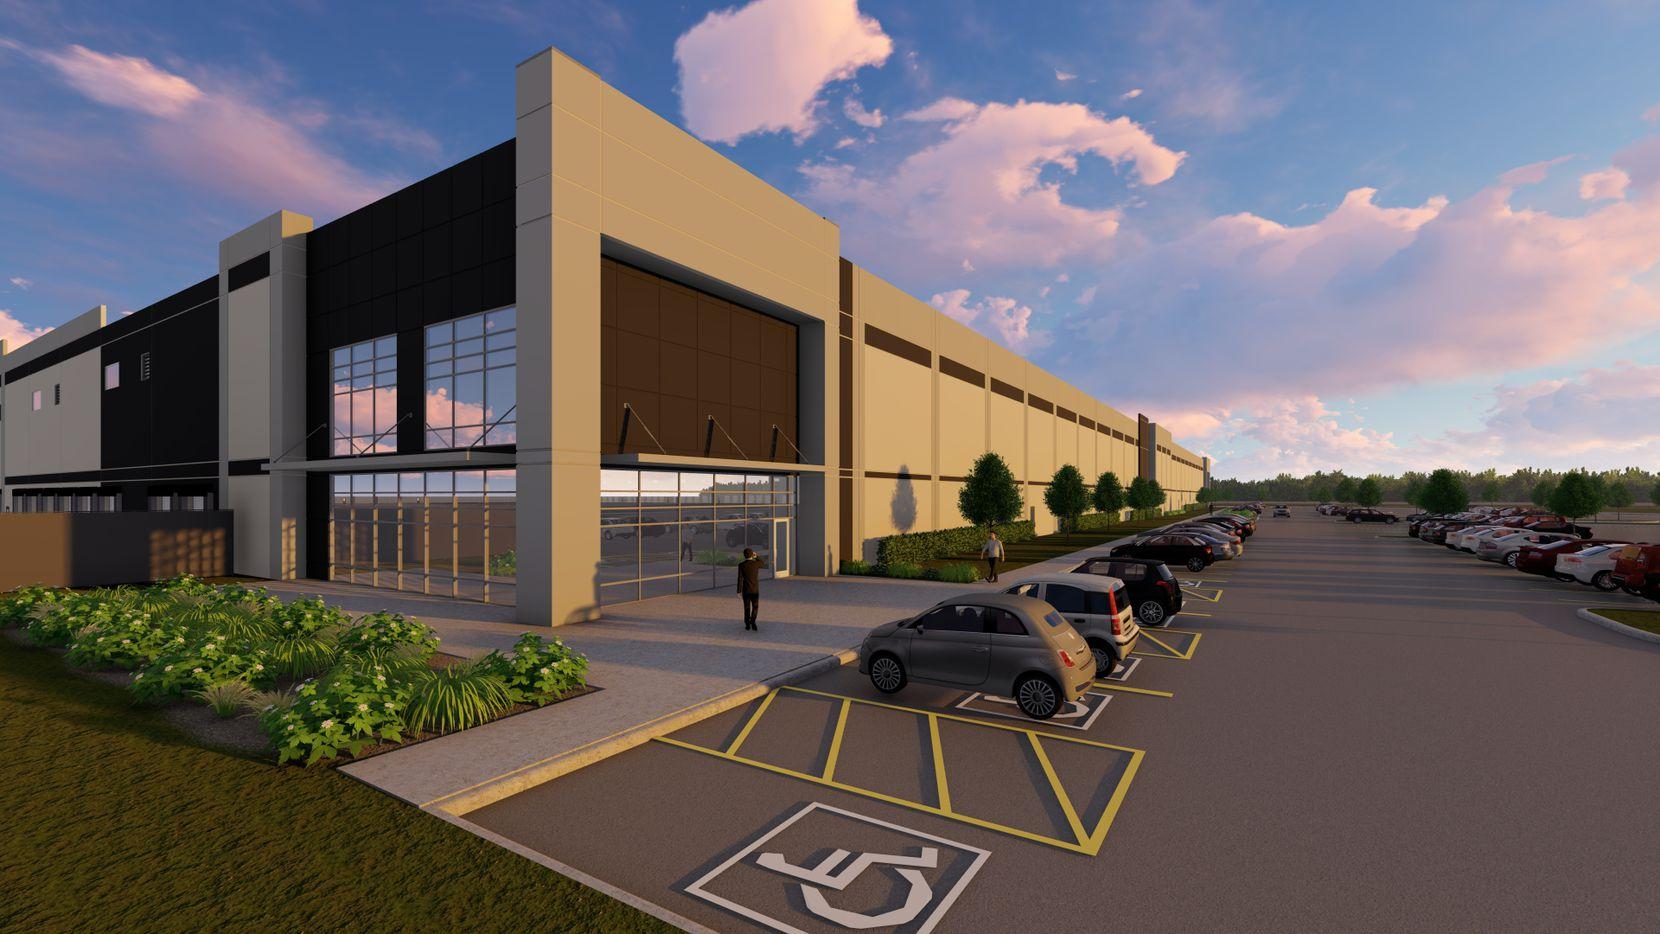 Jones Development is building the new distribution center for Ollie's Bargain Outlet.